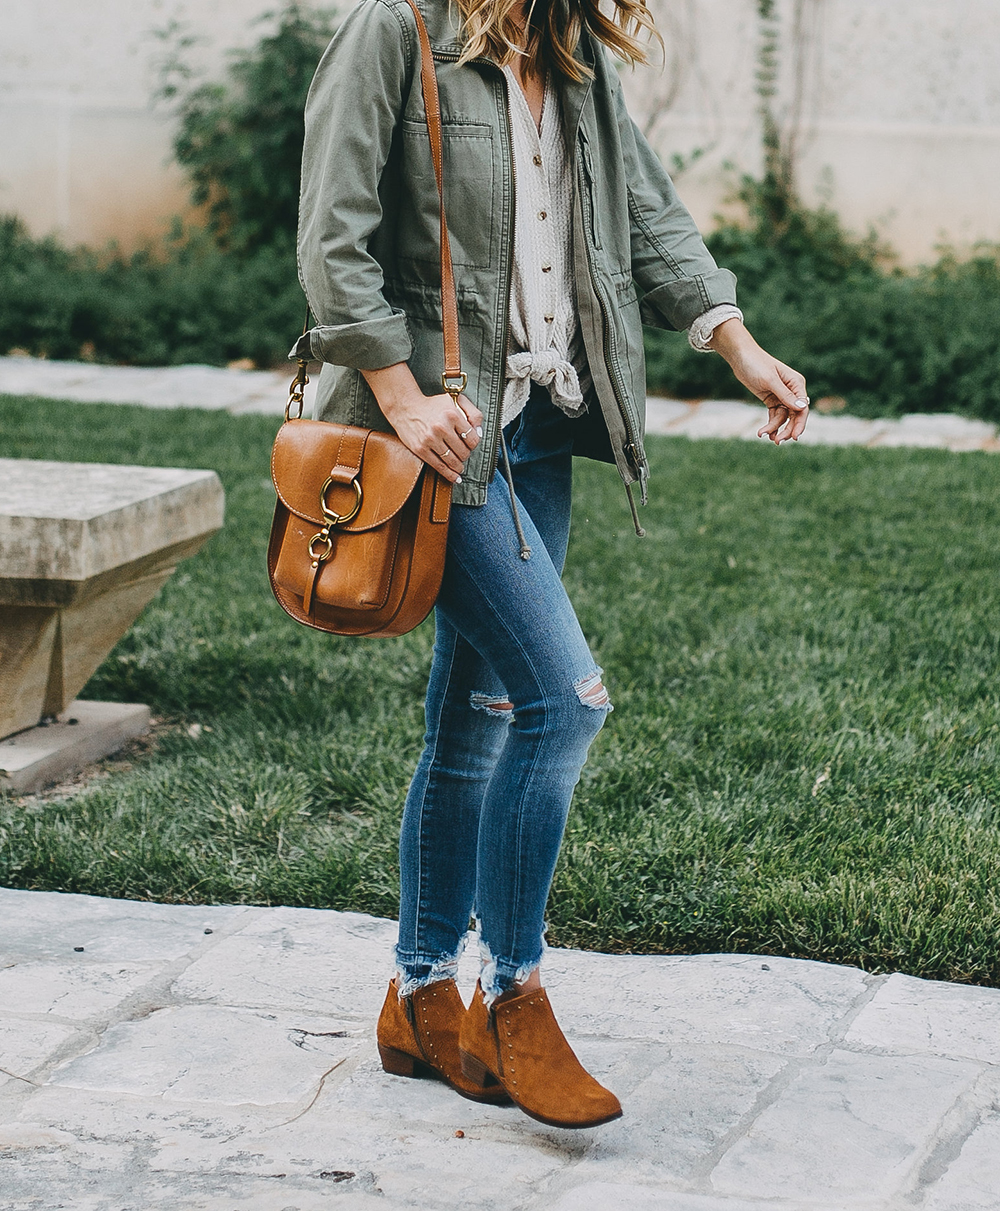 livvyland-blog-olivia-watson-austin-texas-fashion-blogger-minnatonka-moccasins-tan-suede-ankle-booties-madewell-utility-fleet-jacket-8